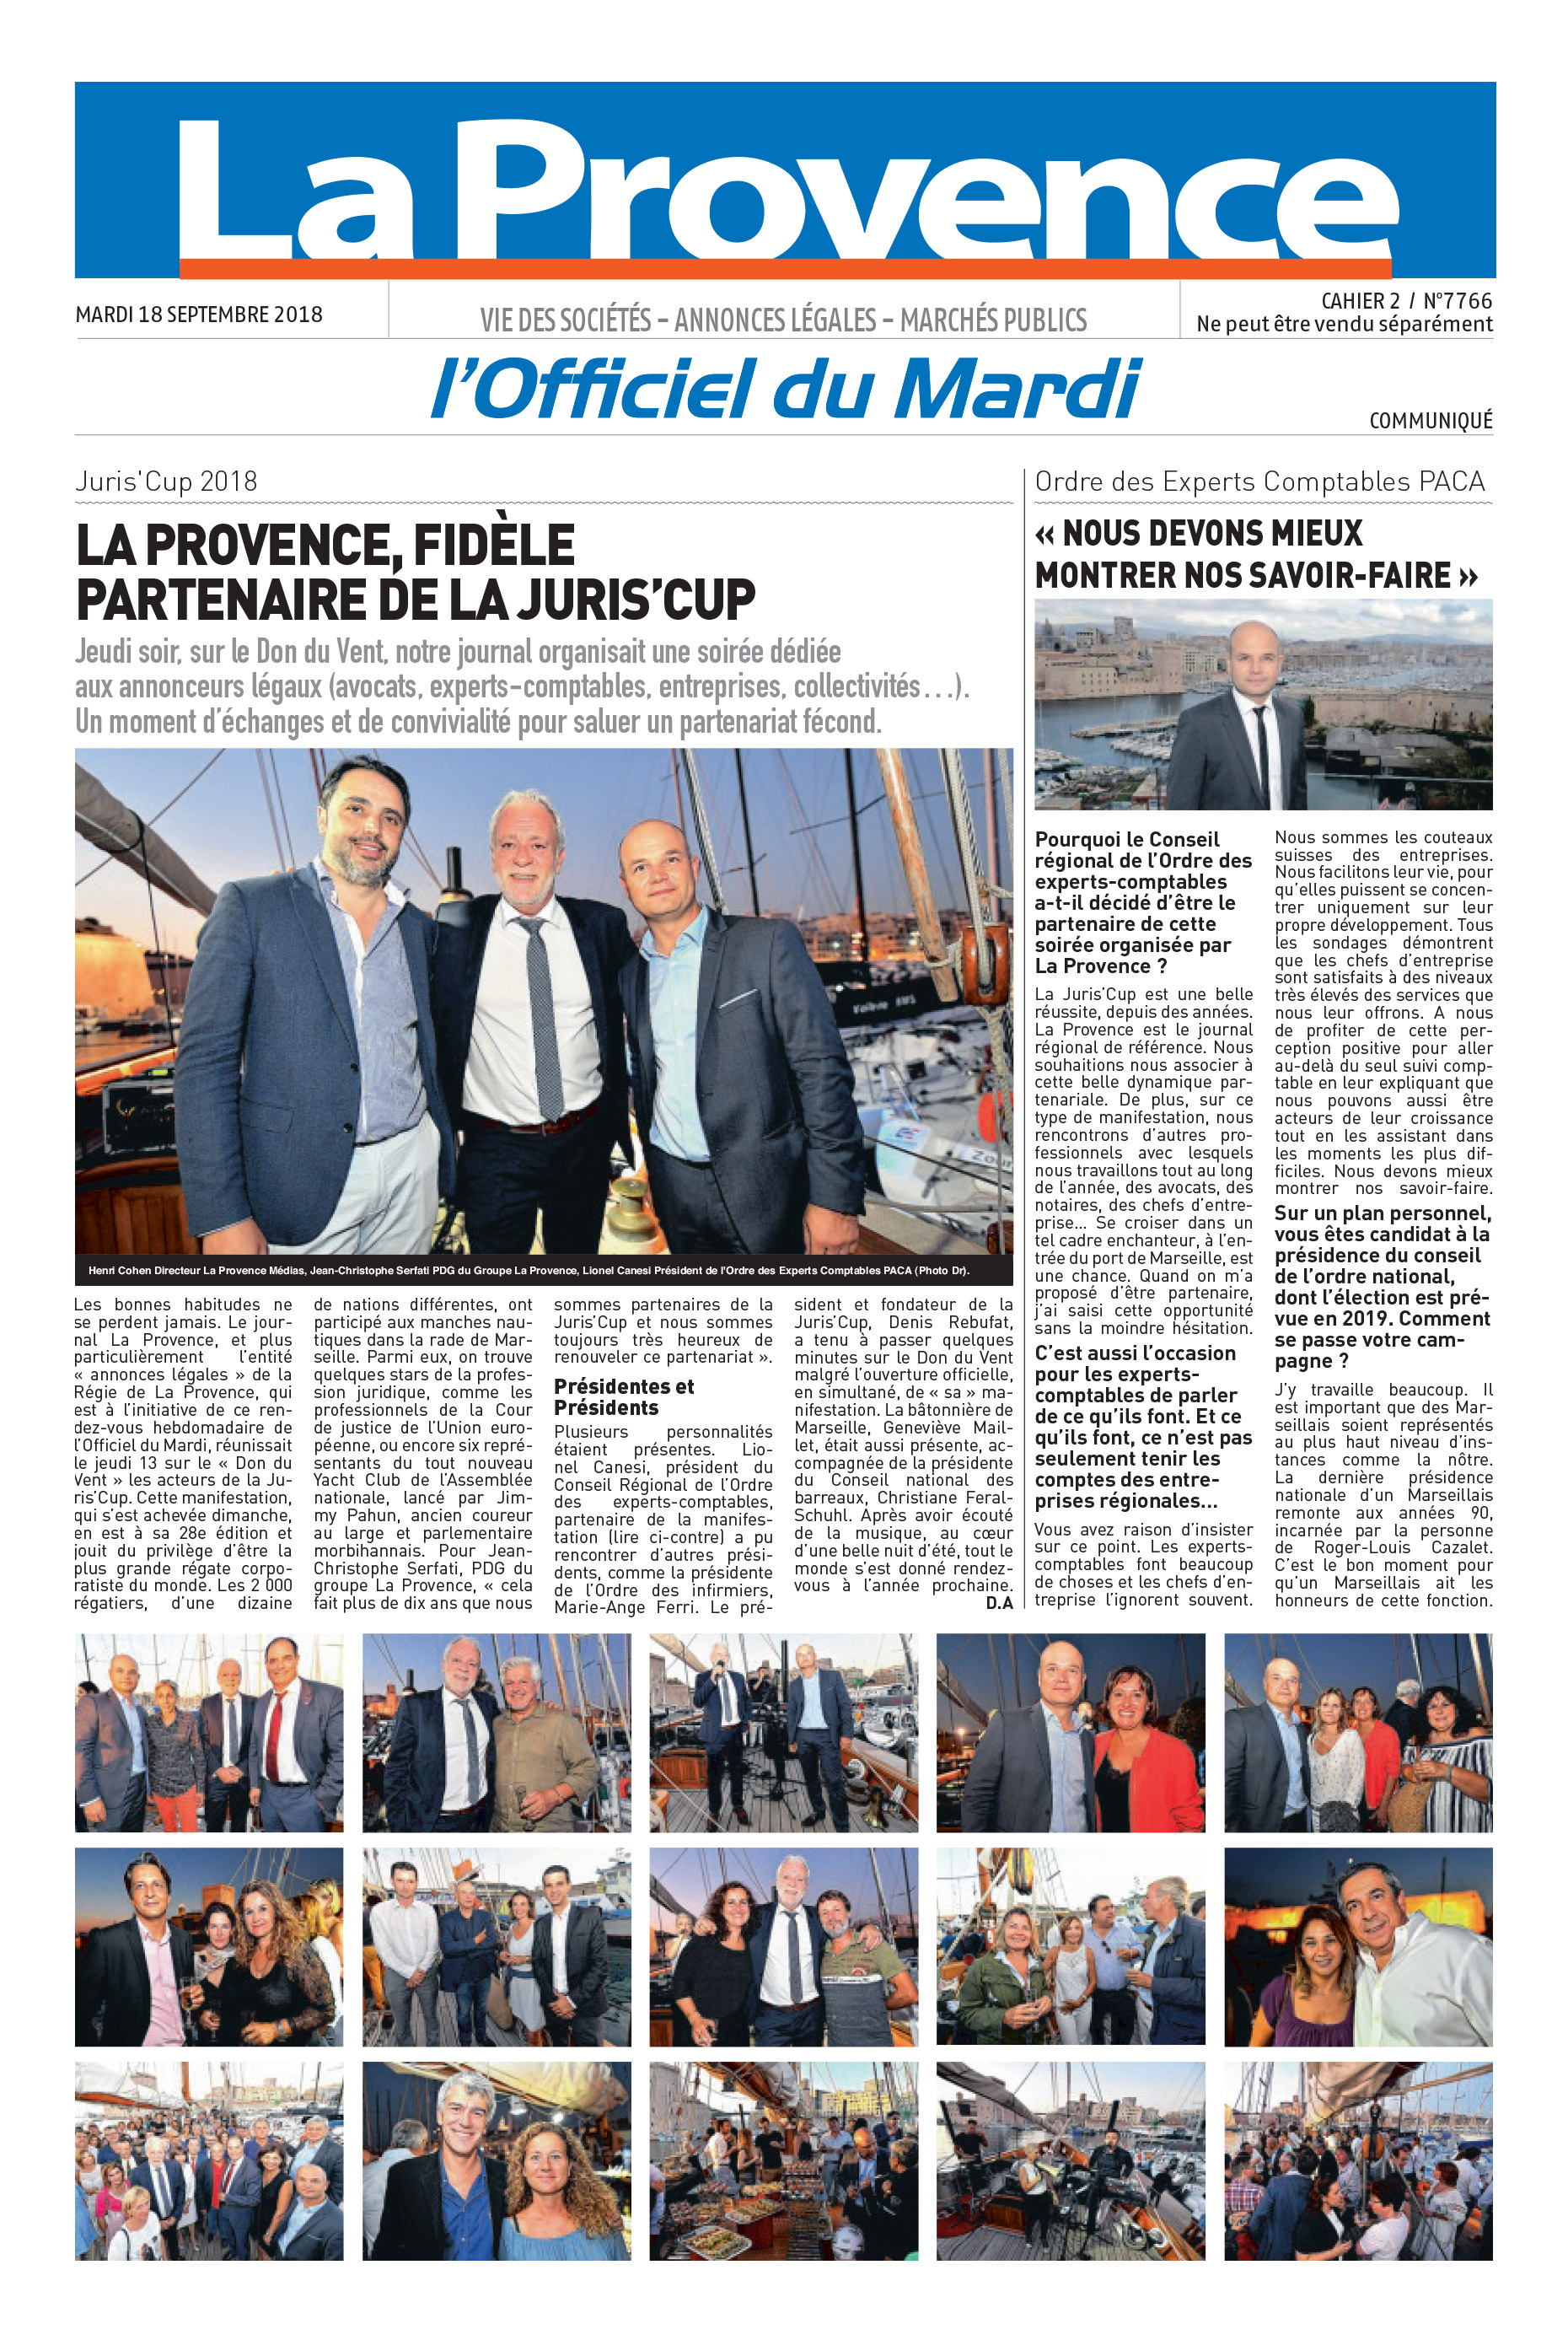 Expert Comptable - La Provence - JurisCup2018